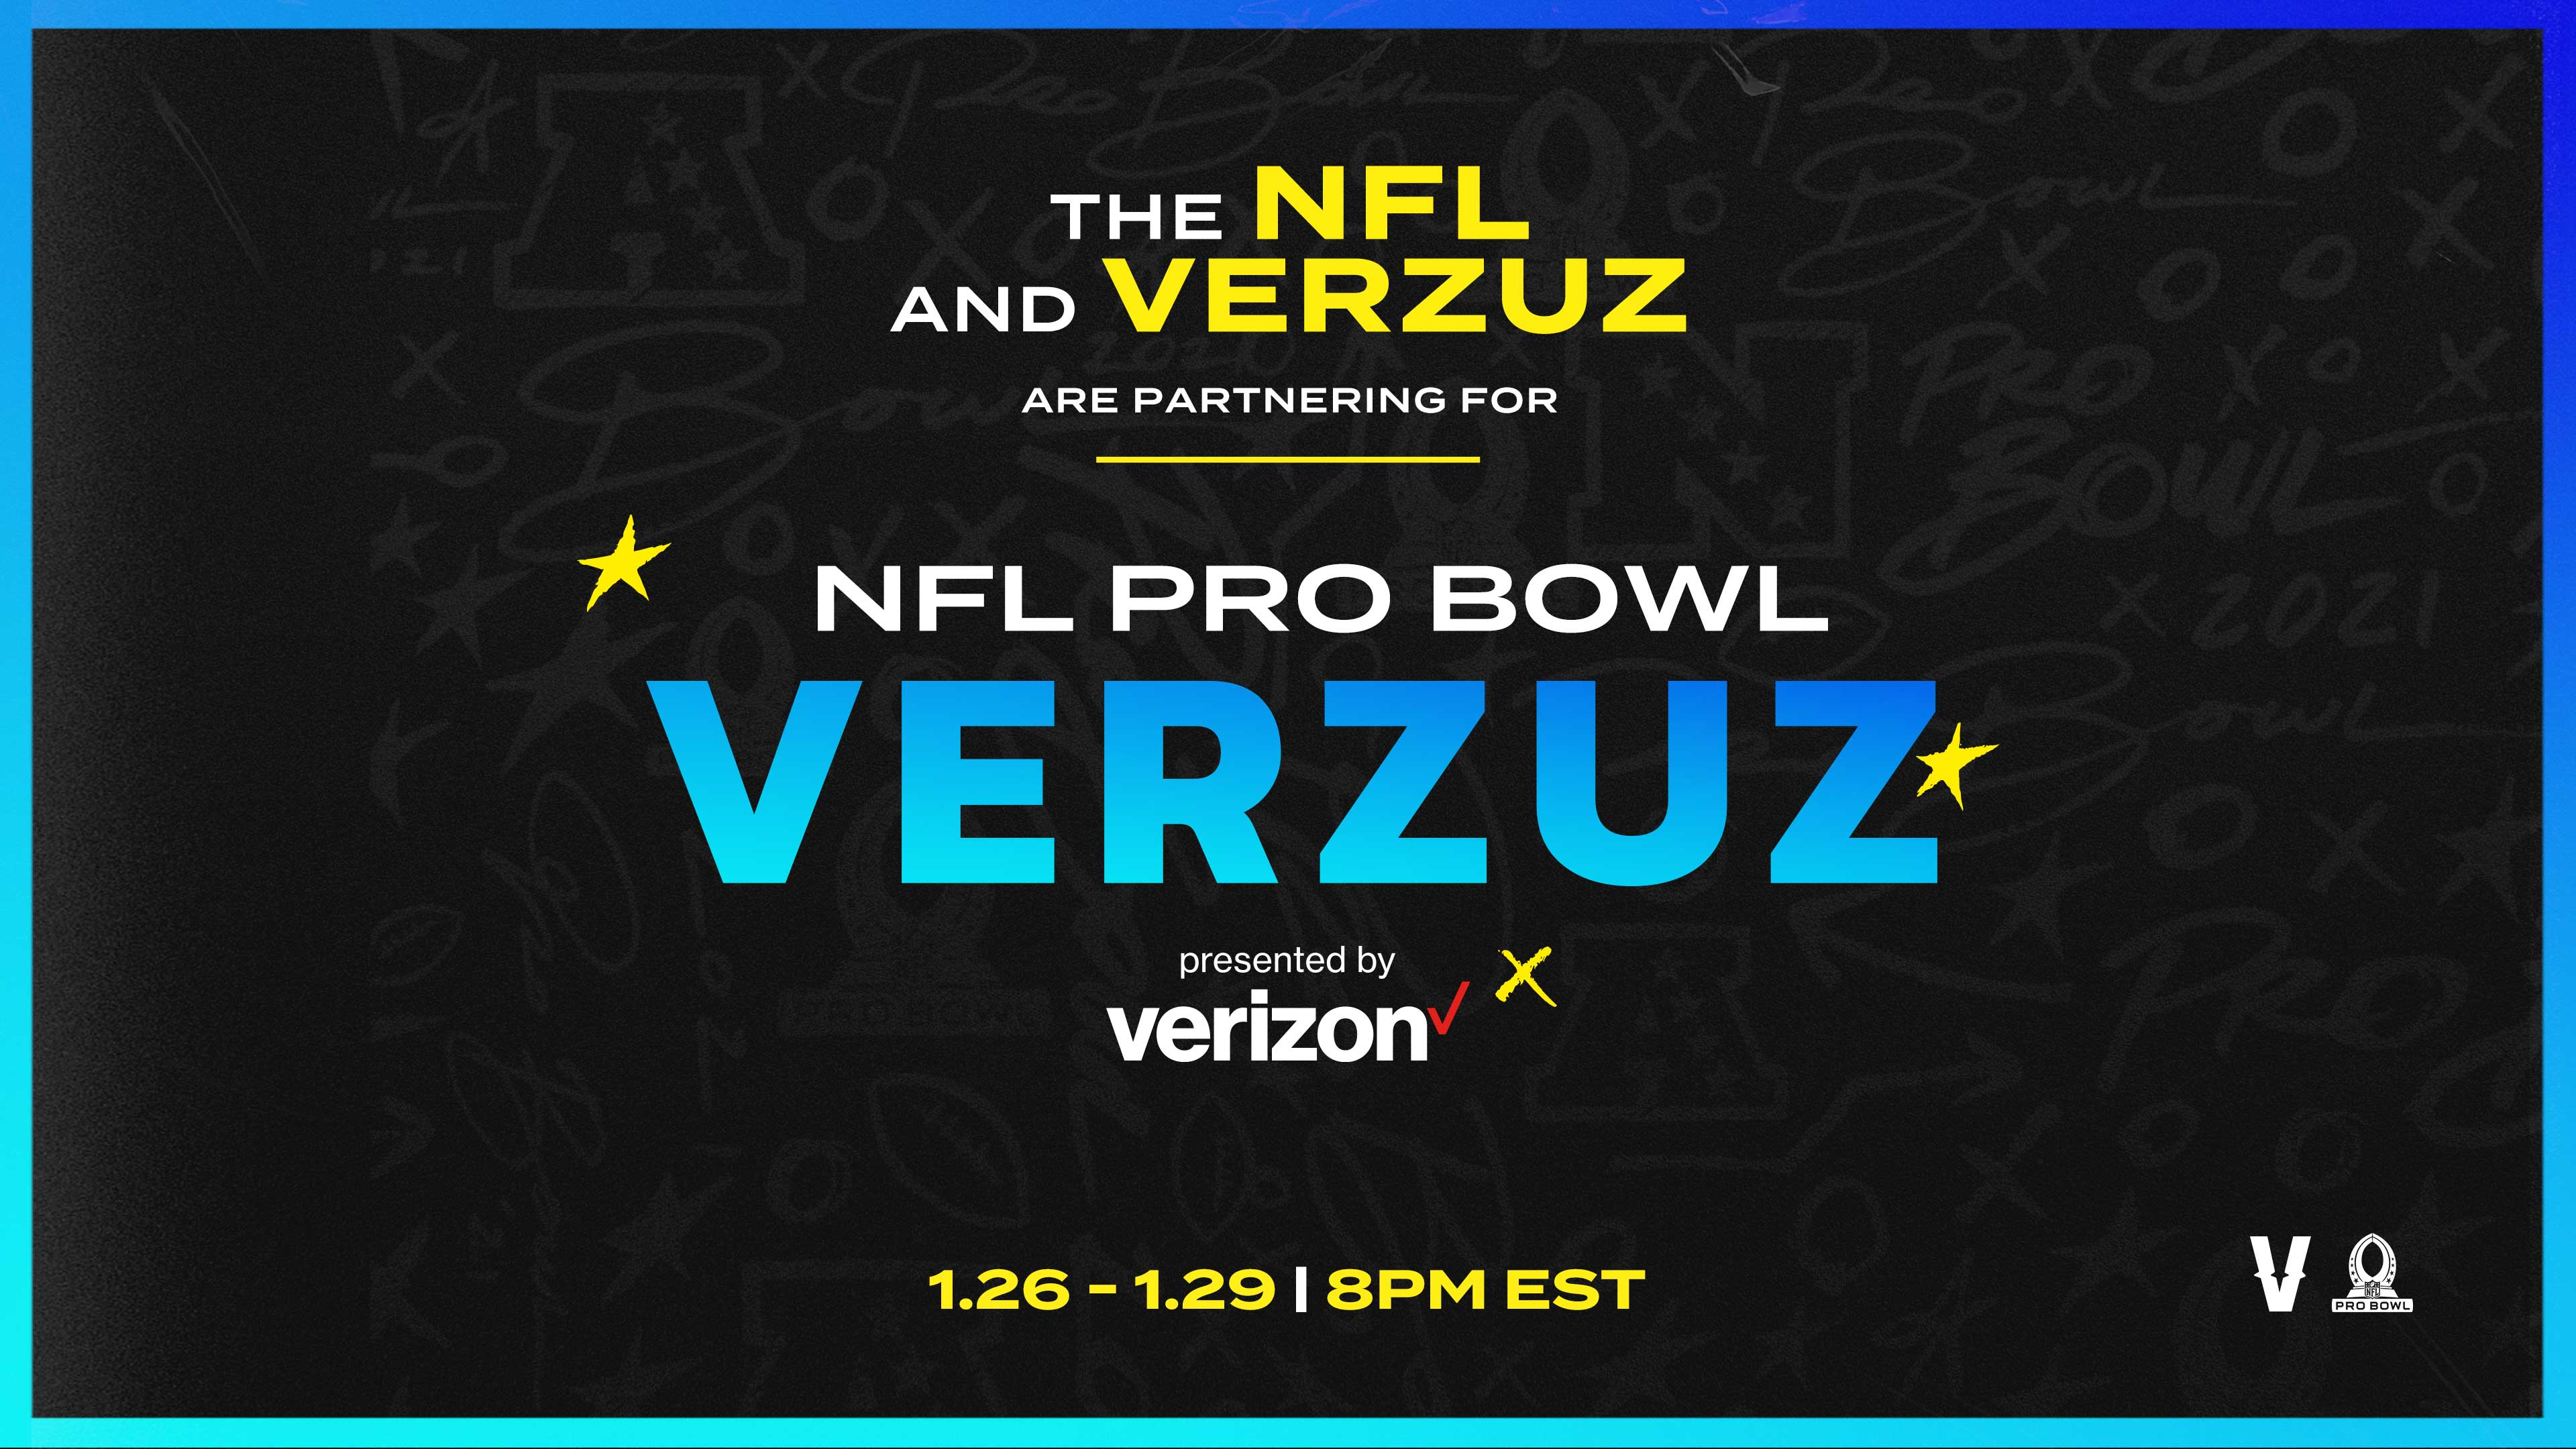 NFL Pro Bowl Verzuz Edition presented by Verizon